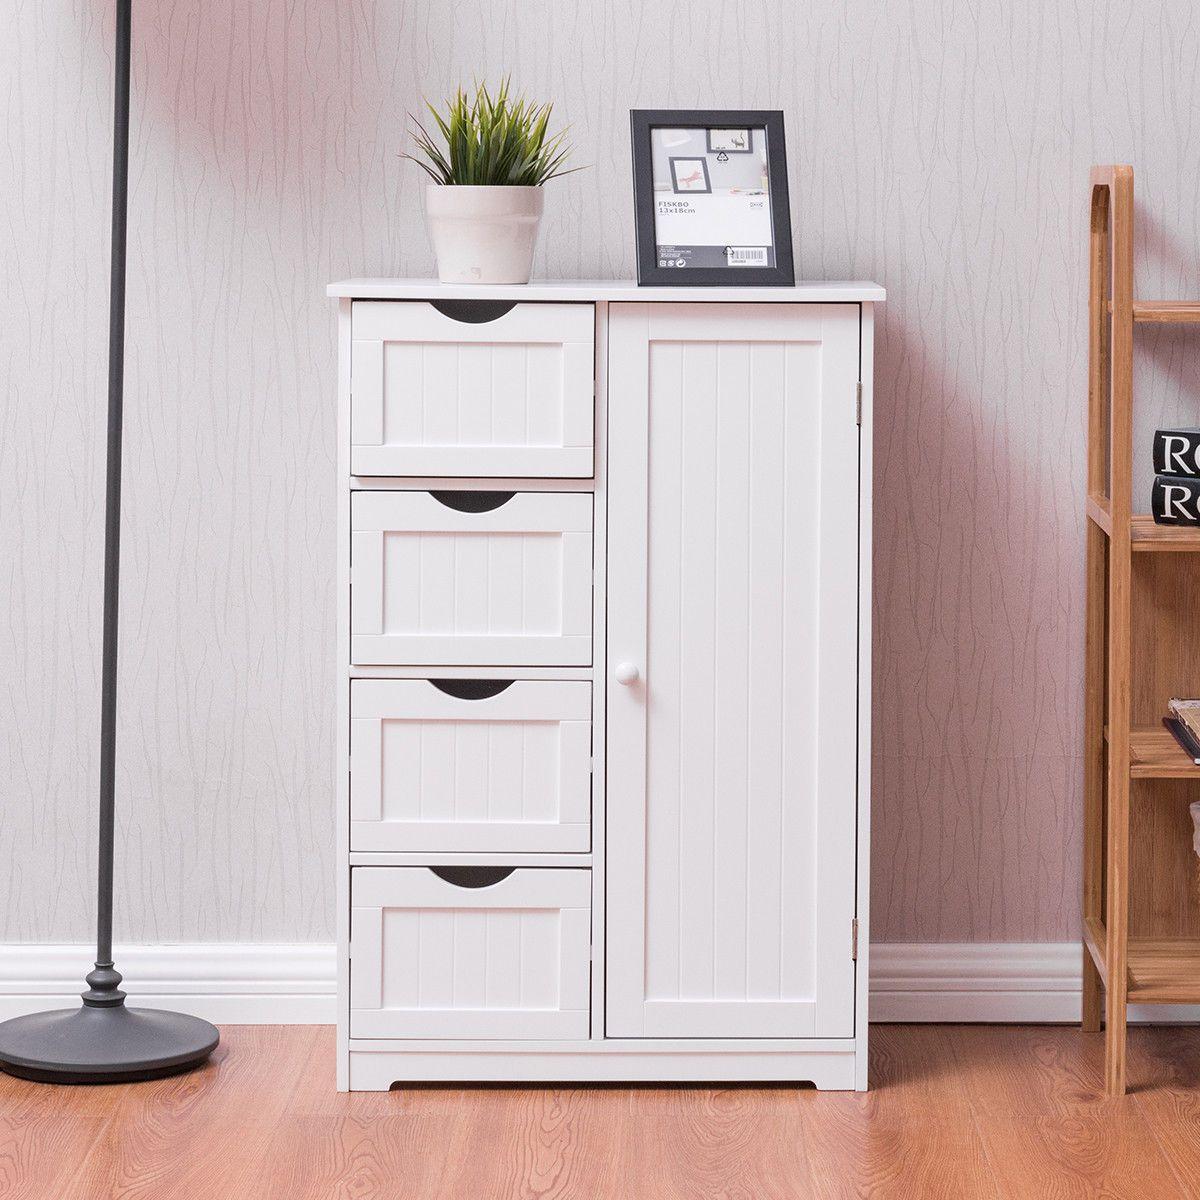 Goplus Wooden 4 Drawer Bathroom Cabinet Storage Cupboard 2 Shelves